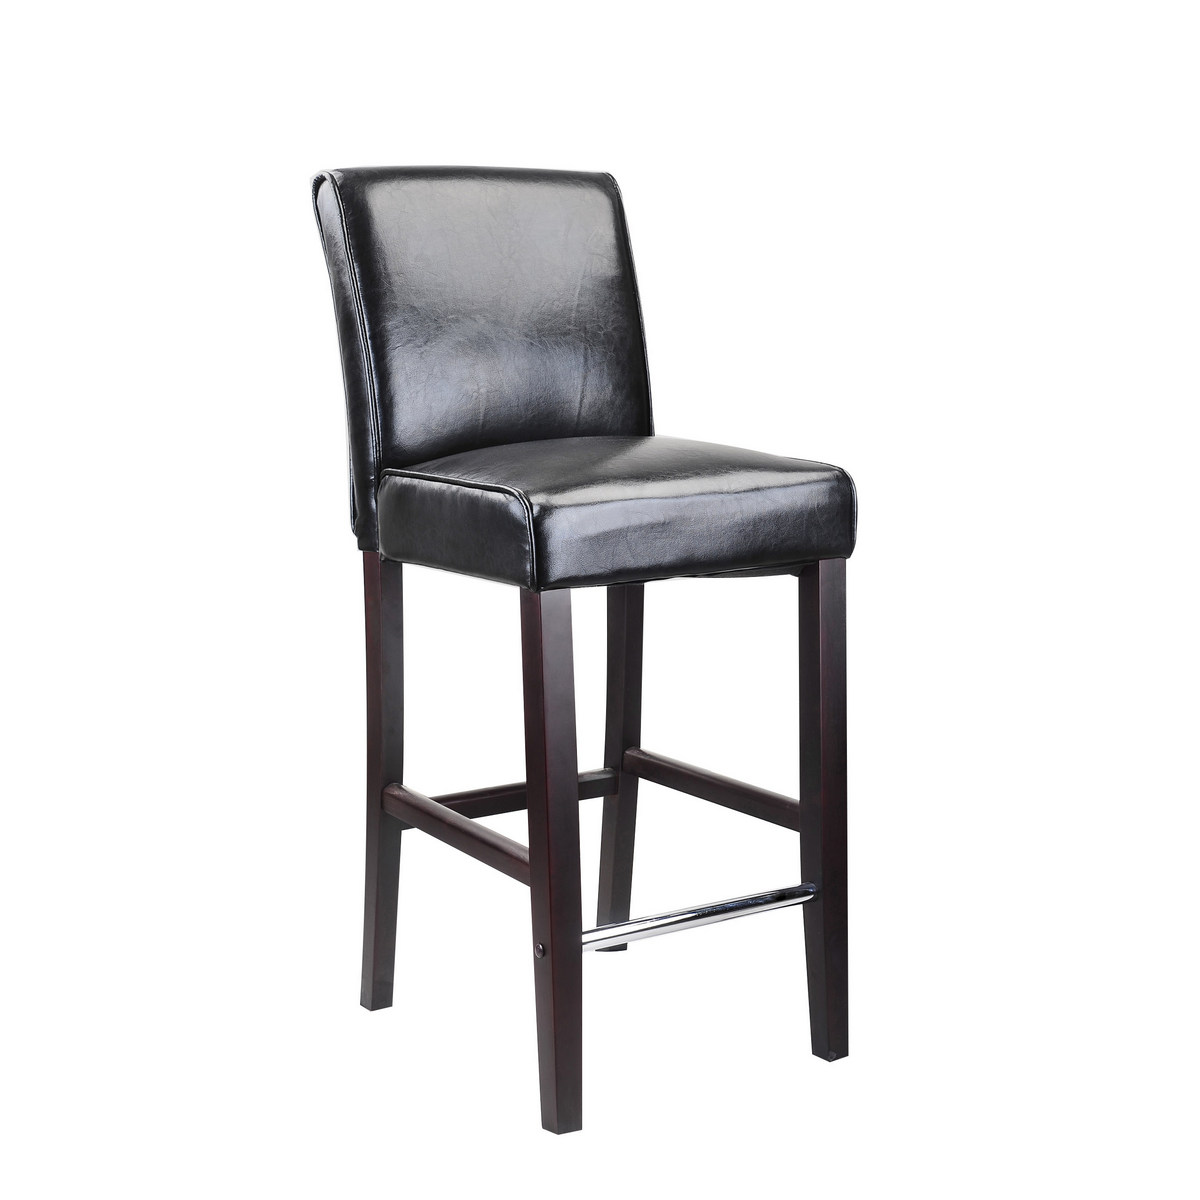 CorLiving DAD-503-B Antonio Bar Height Barstool in Black Bonded Leather